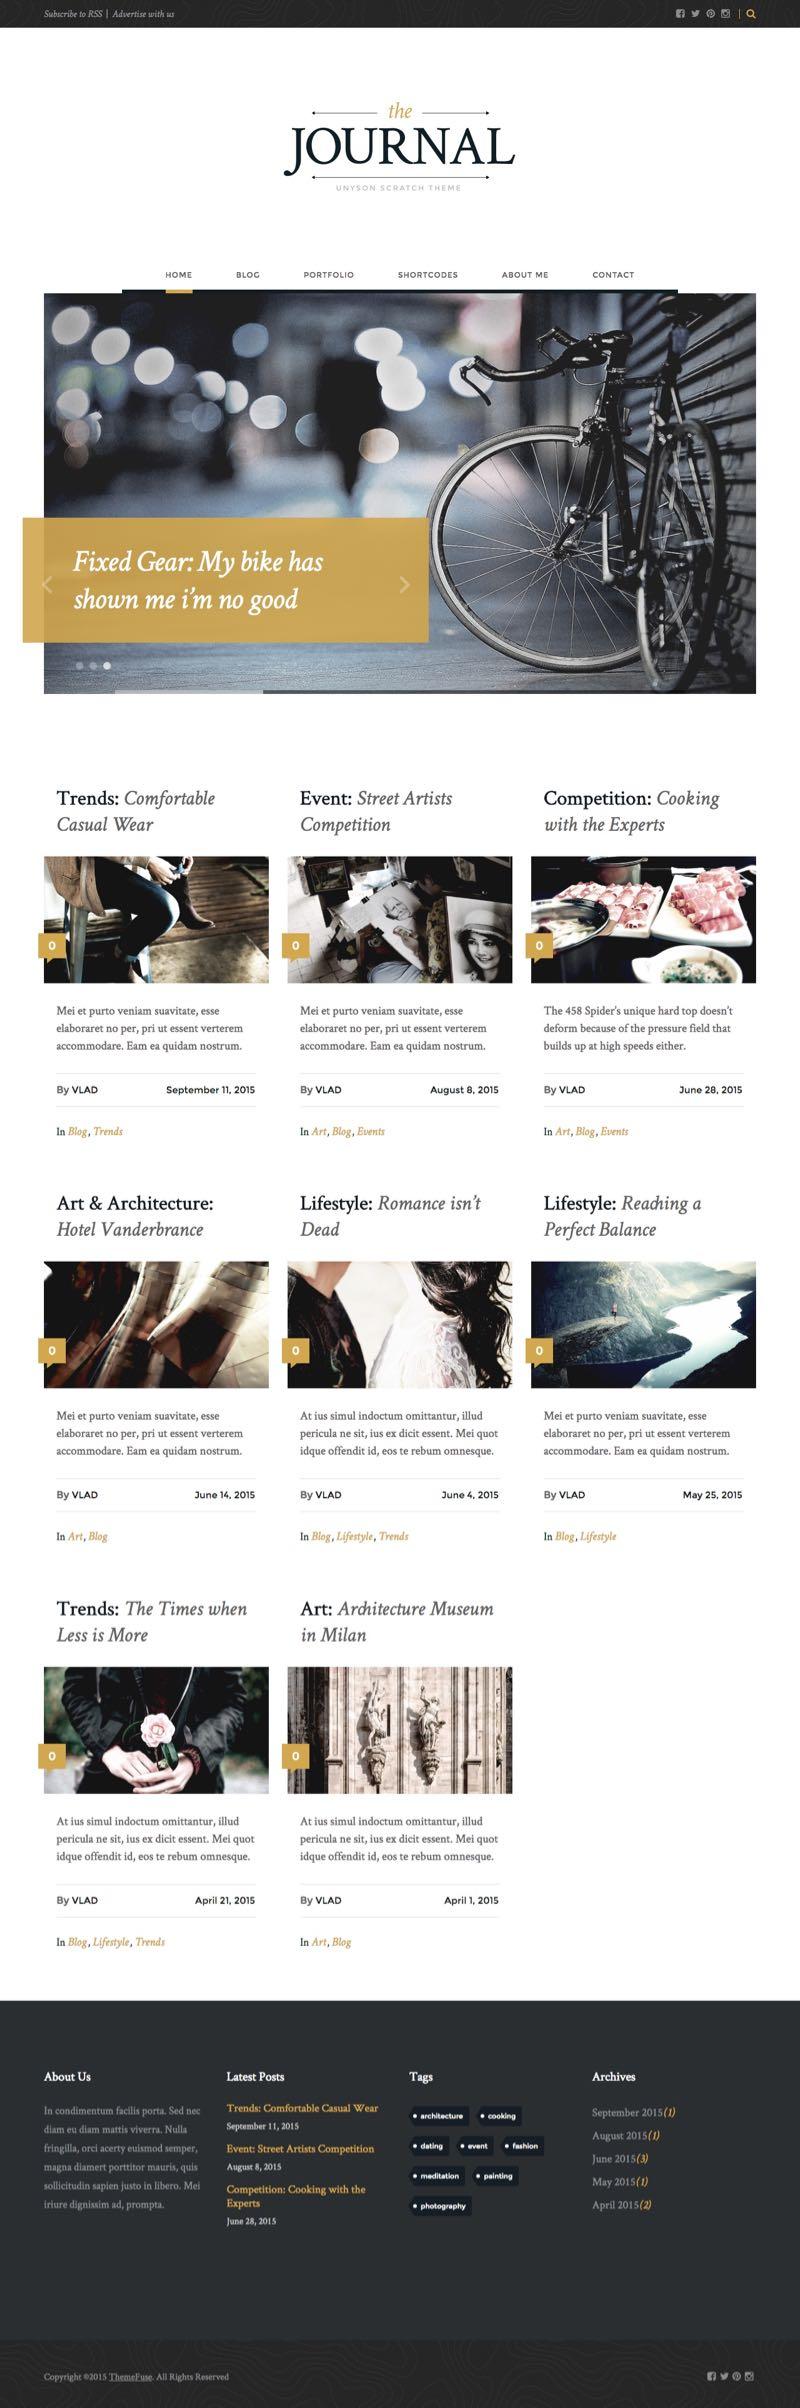 Journal  U2013 Free Wordpress Blog Or Online Magazine Theme